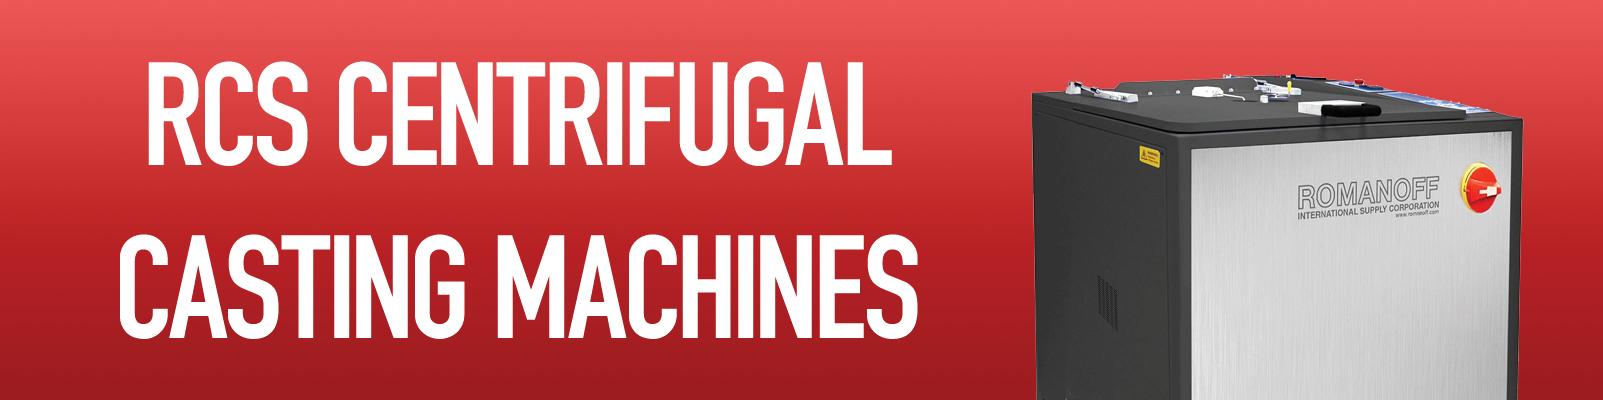 RCS Centrifugal Casting Machines